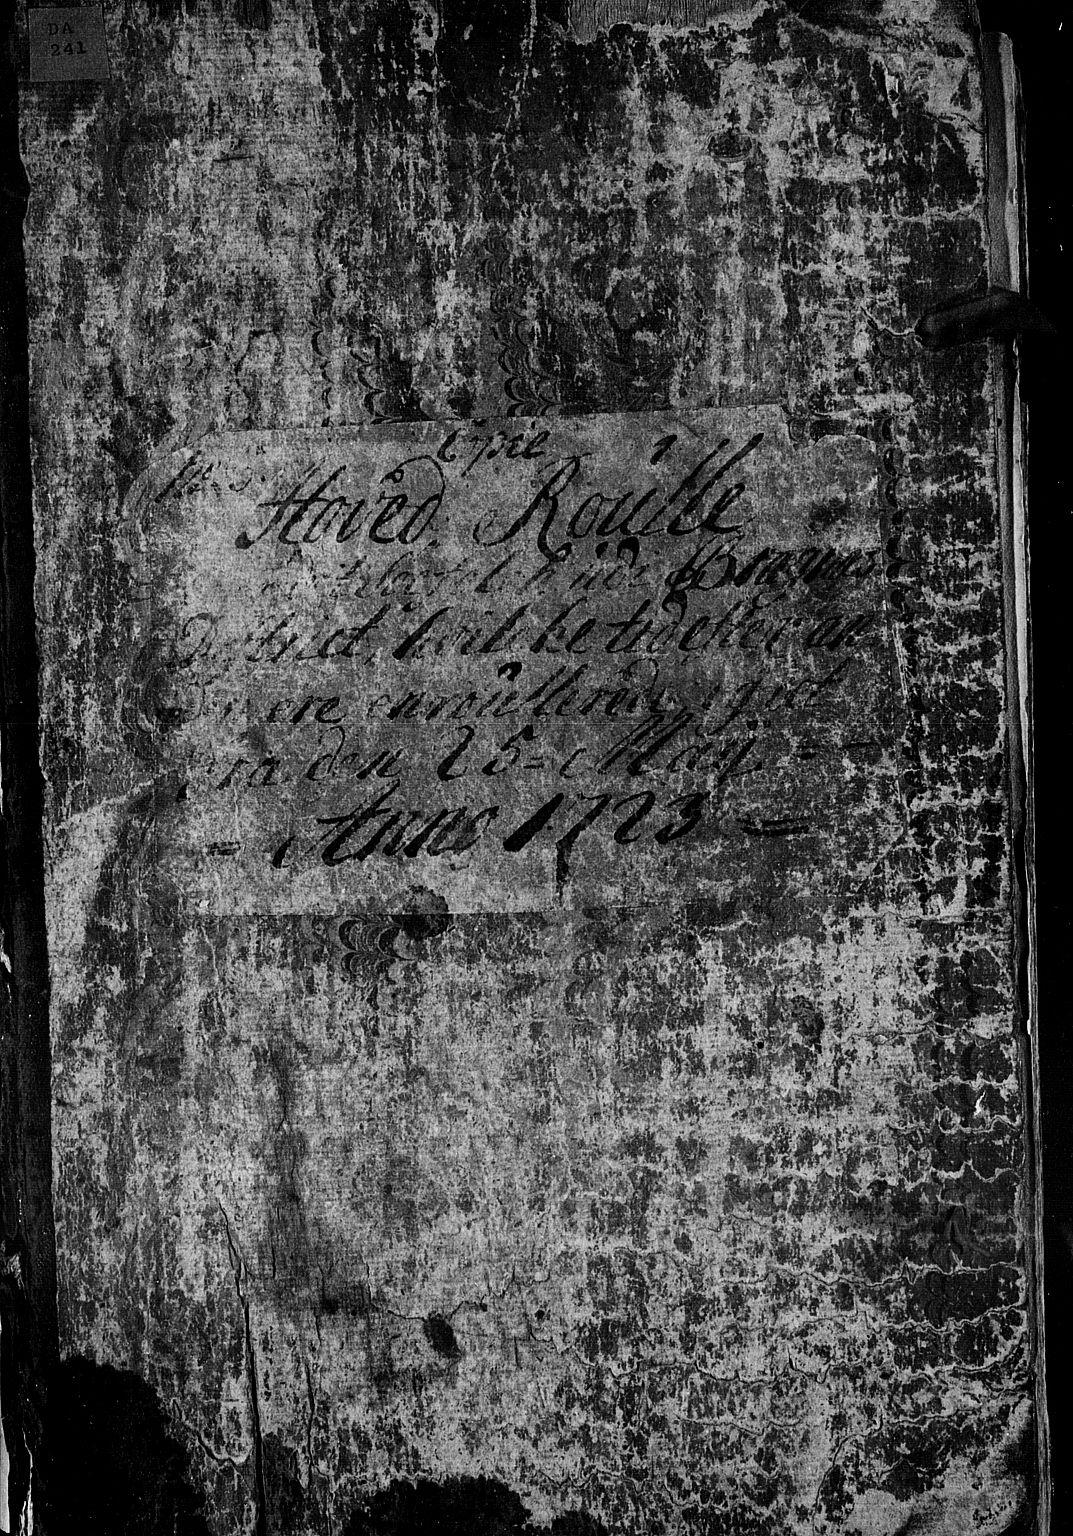 SAKO, Drammen innrulleringsdistrikt, F/Fa/L0004: Hovedrulle kopi, 1723-1726, s. 2